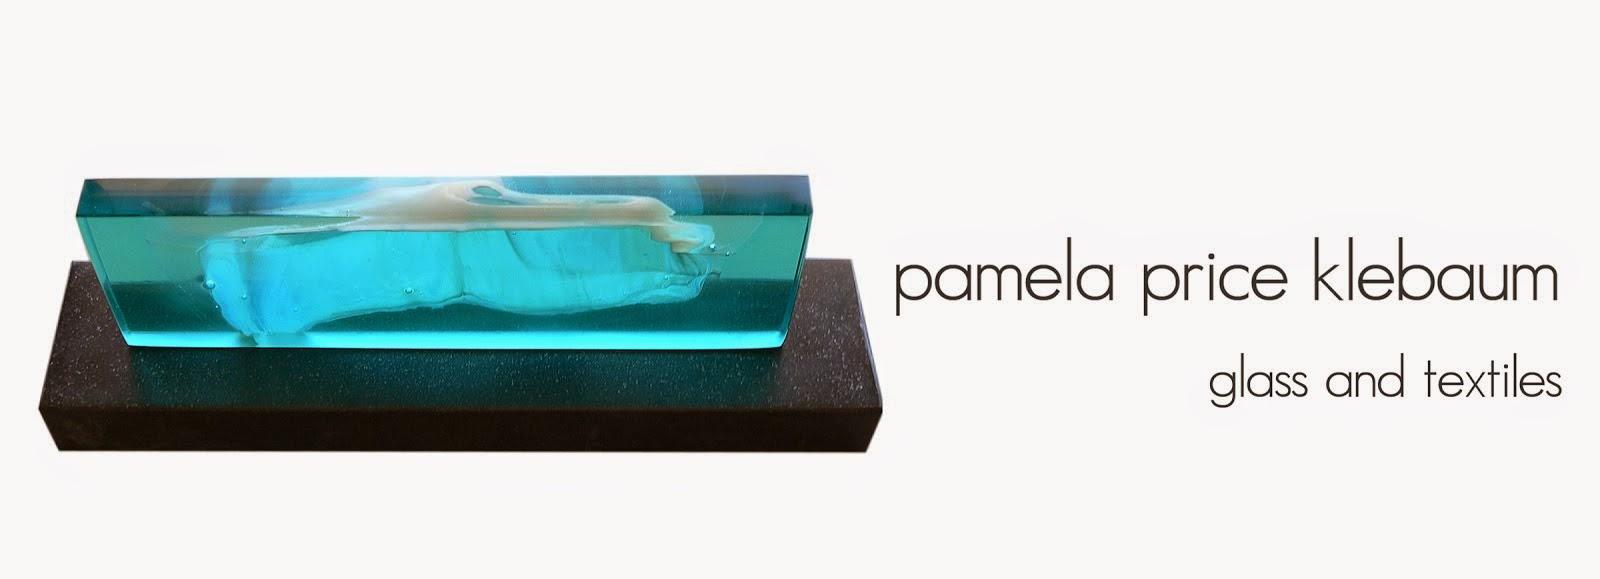 Pamela Price Klebaum